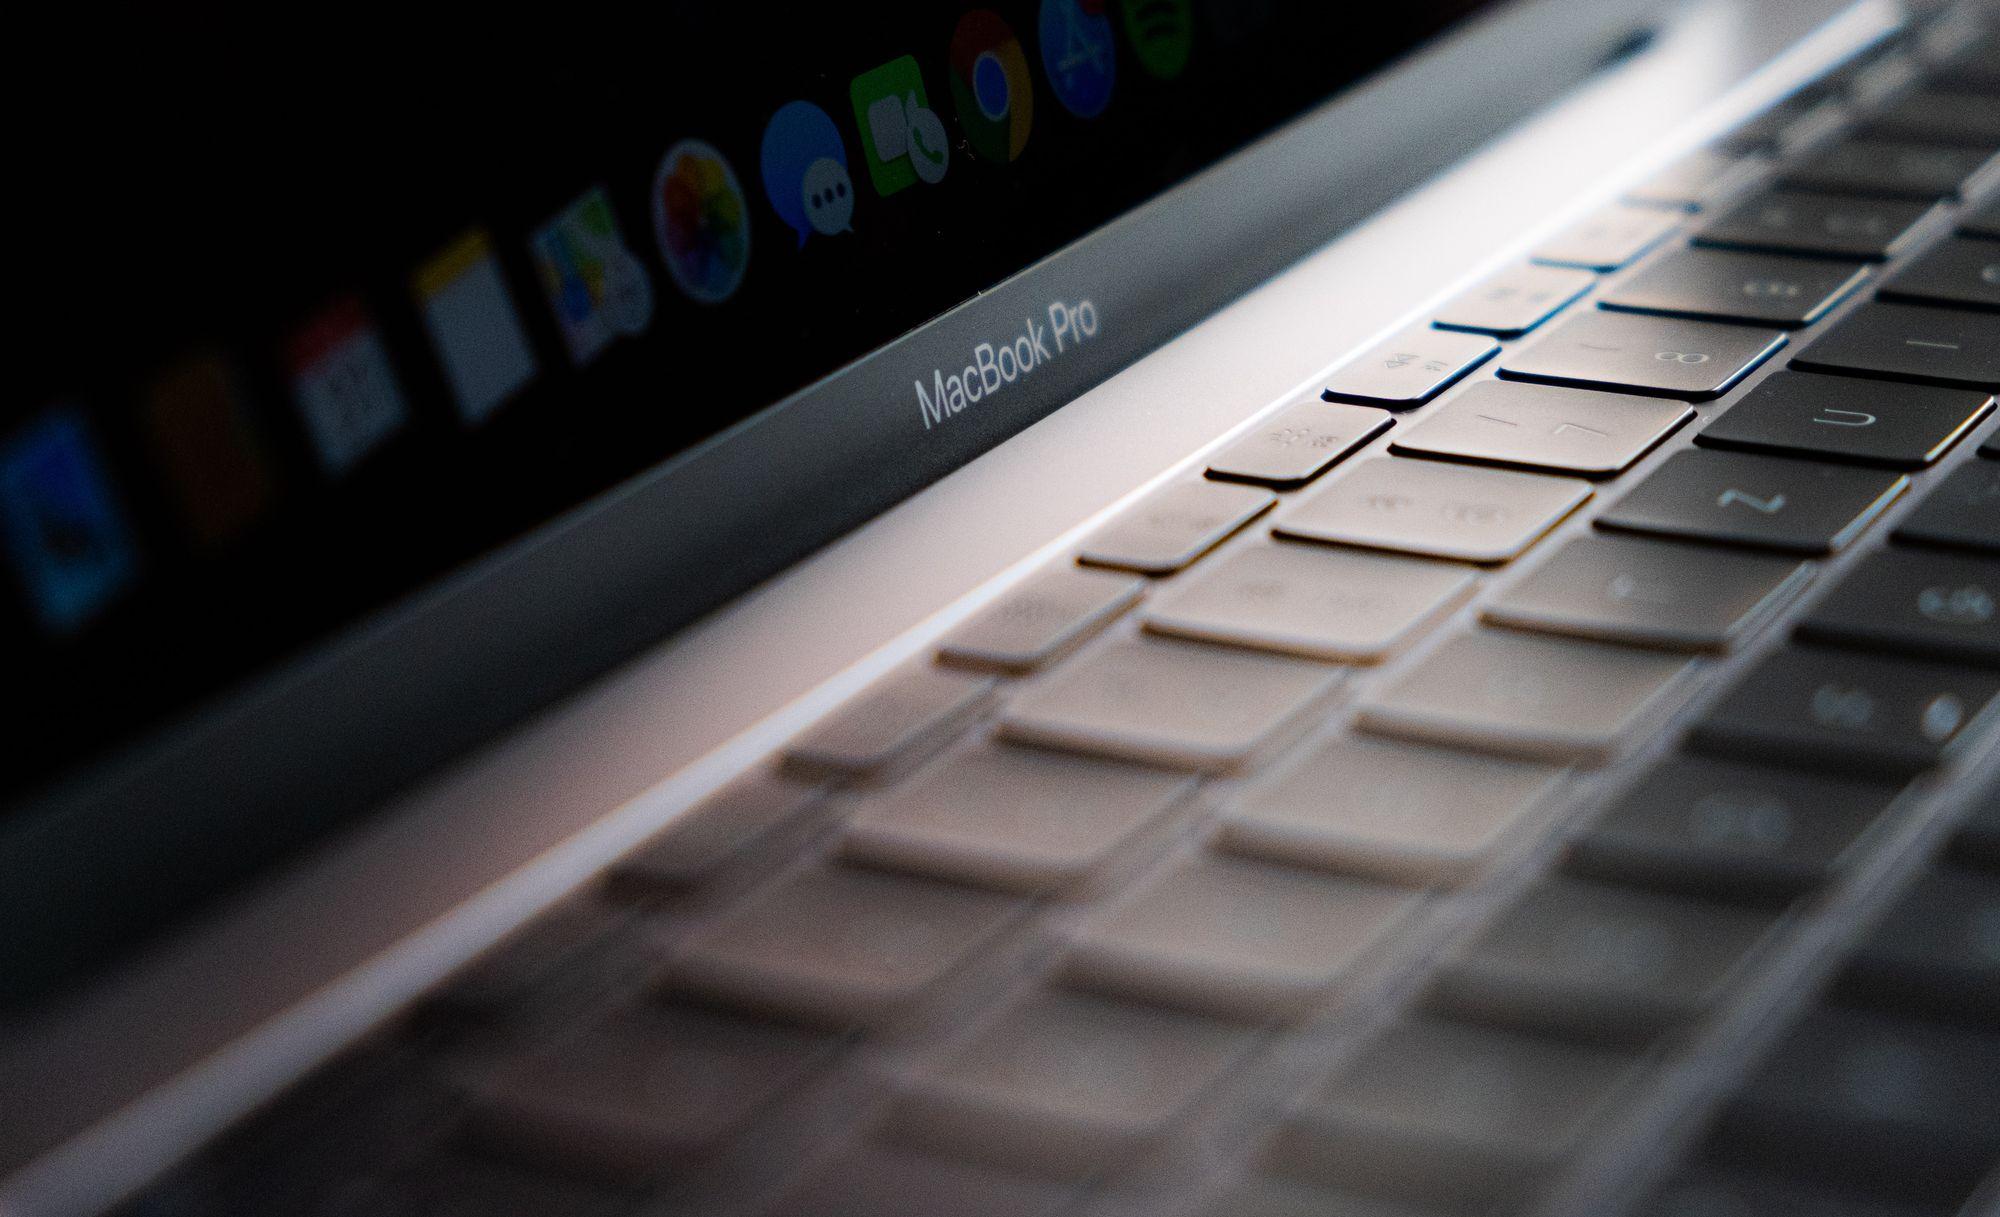 Apple Macbook Pro e iMac 27 polegadas